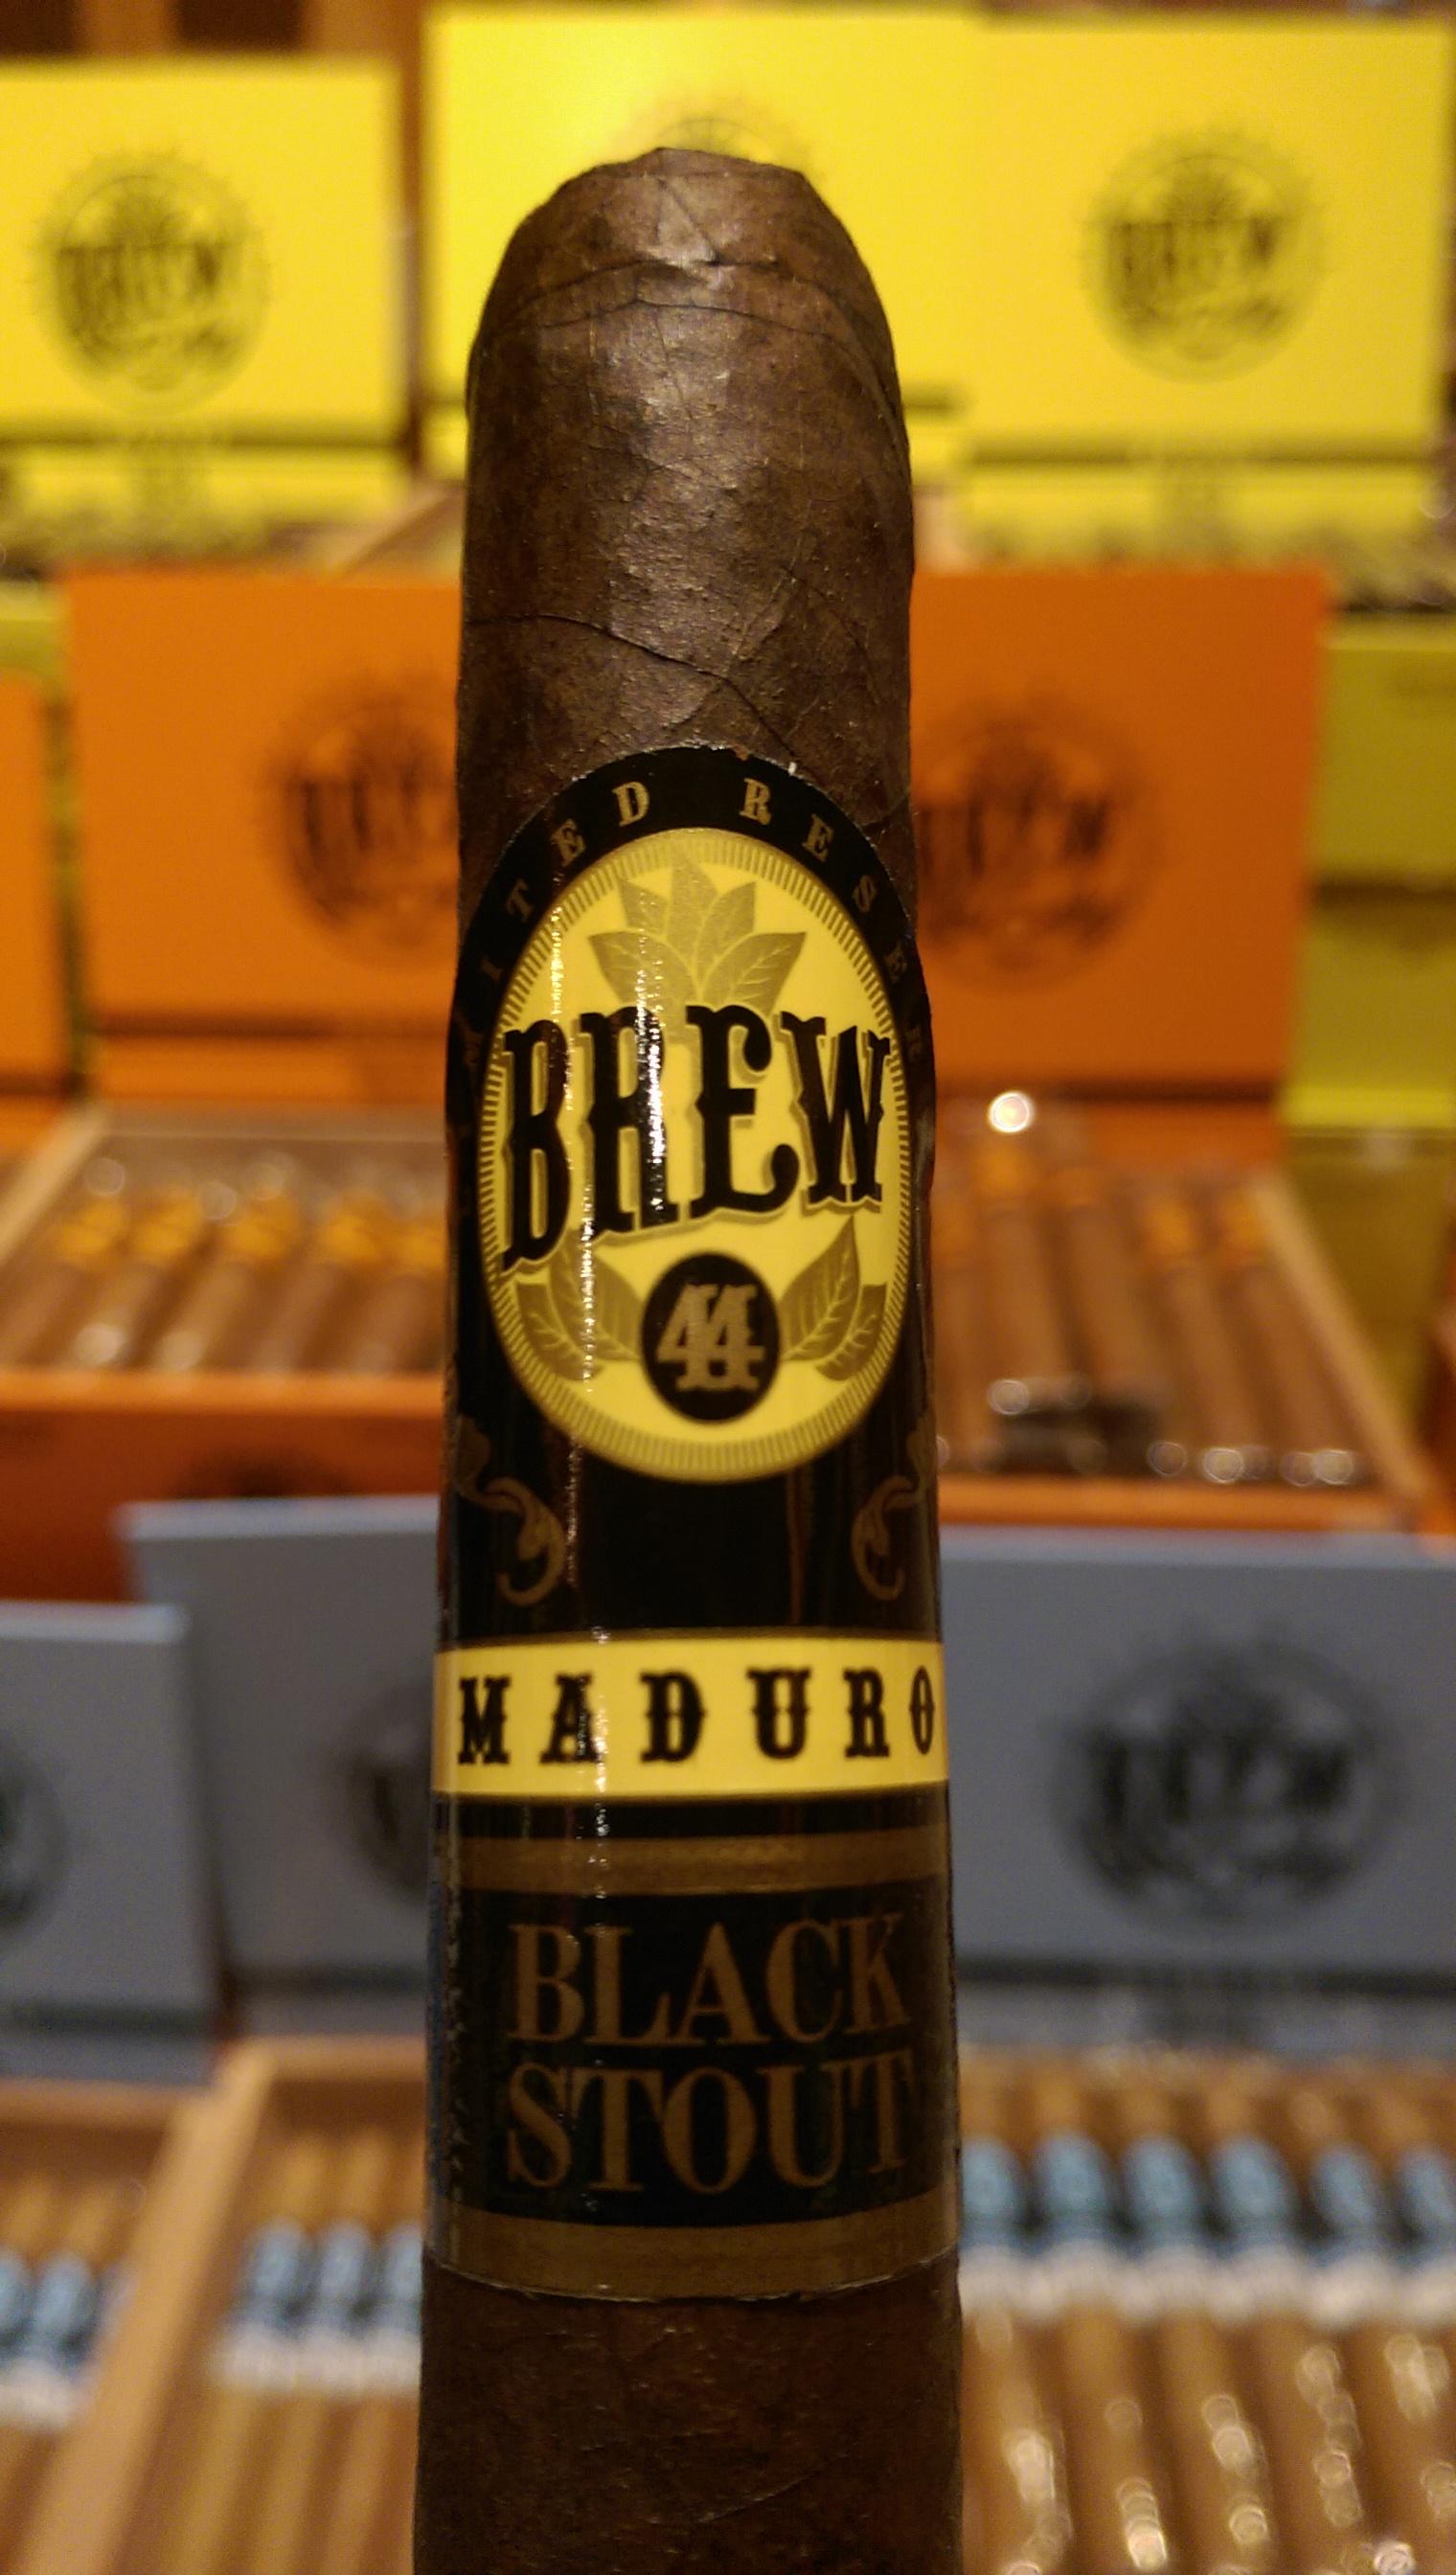 brew 44 maduro black stout.jpg